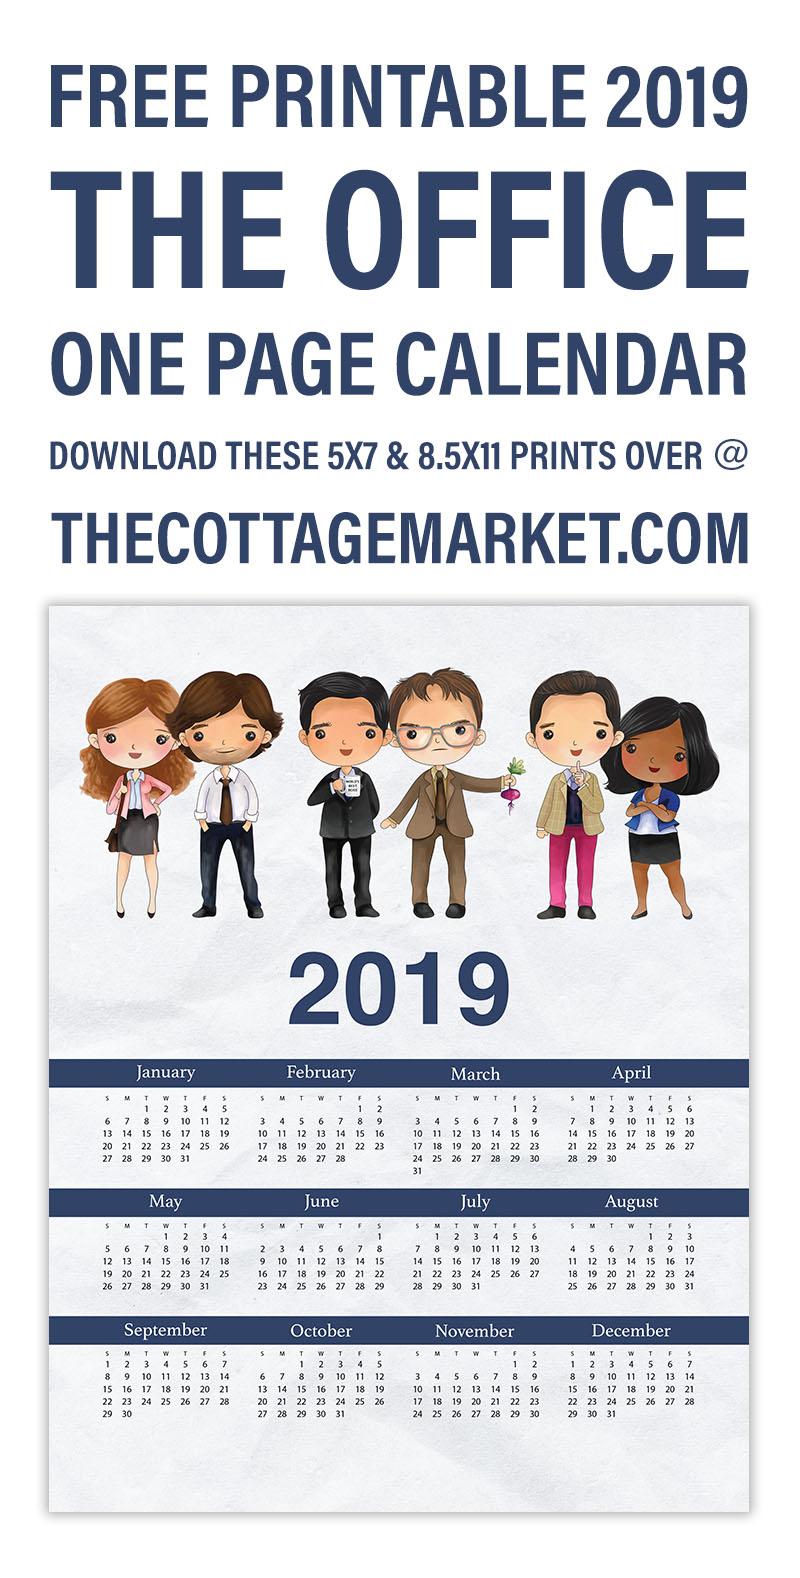 https://thecottagemarket.com/wp-content/uploads/2018/11/TCM-TheOffice-OnePage-2019-Calendar-T-1.jpg